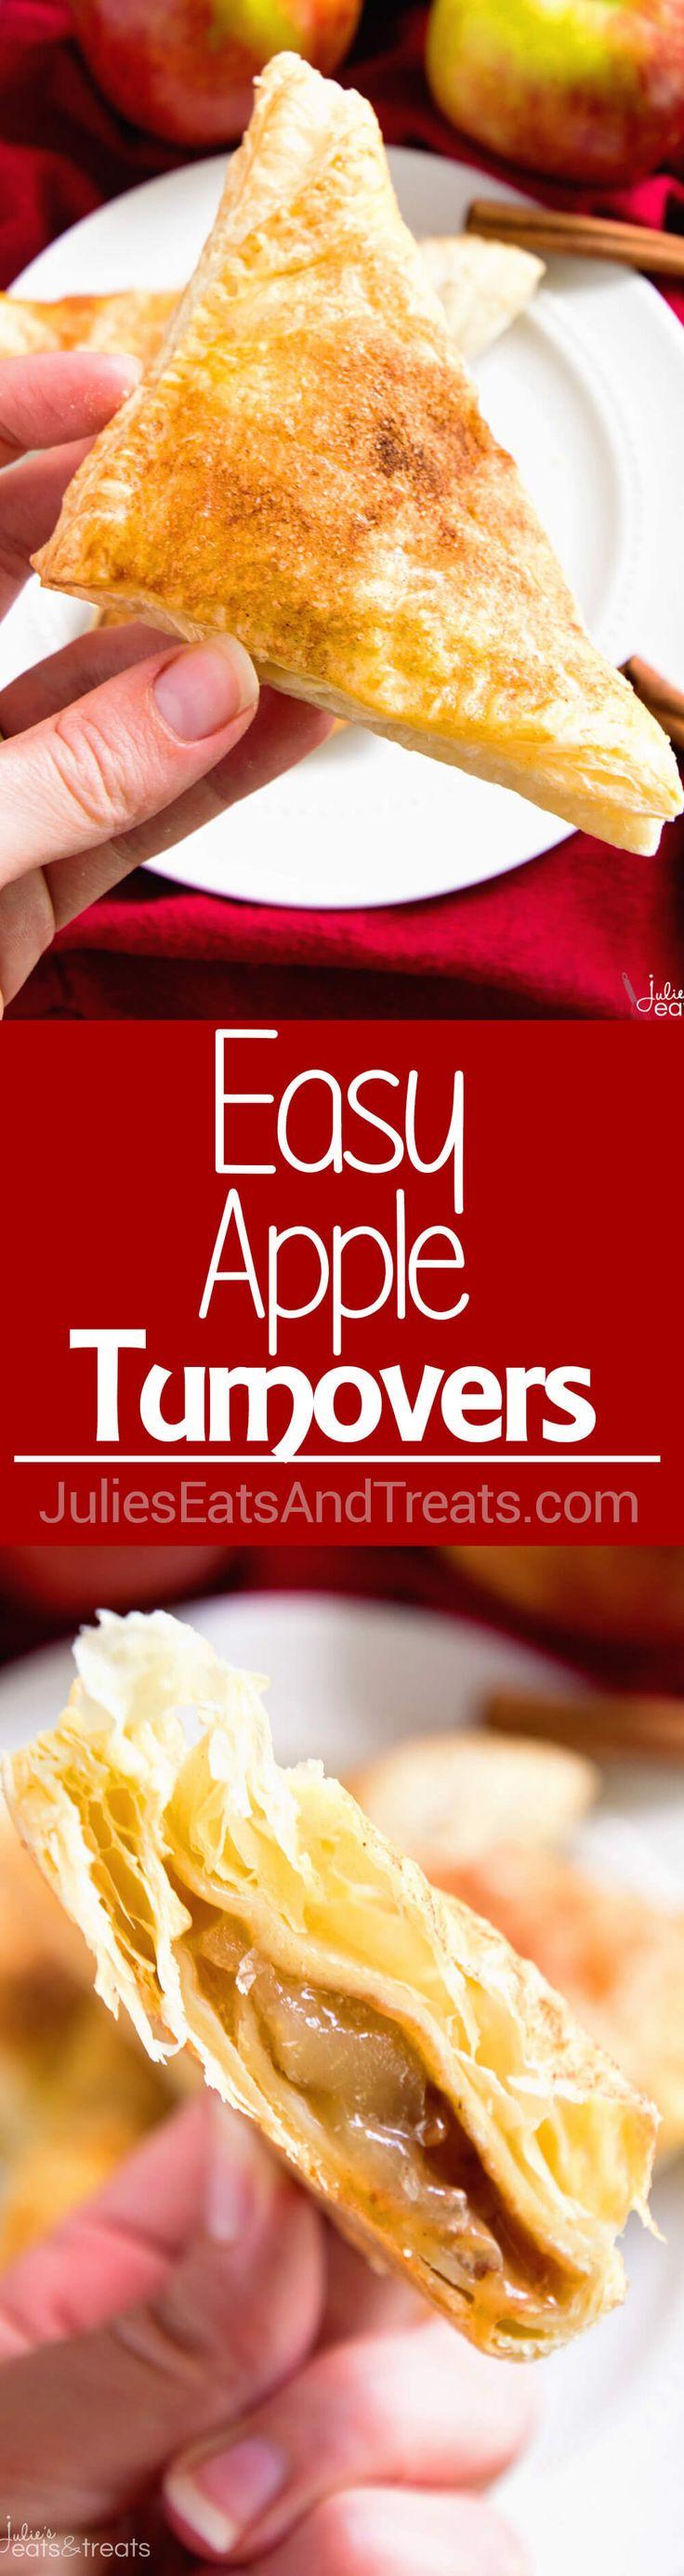 Easy Apple Turnovers This Easy Apple Turnovers Recipe is